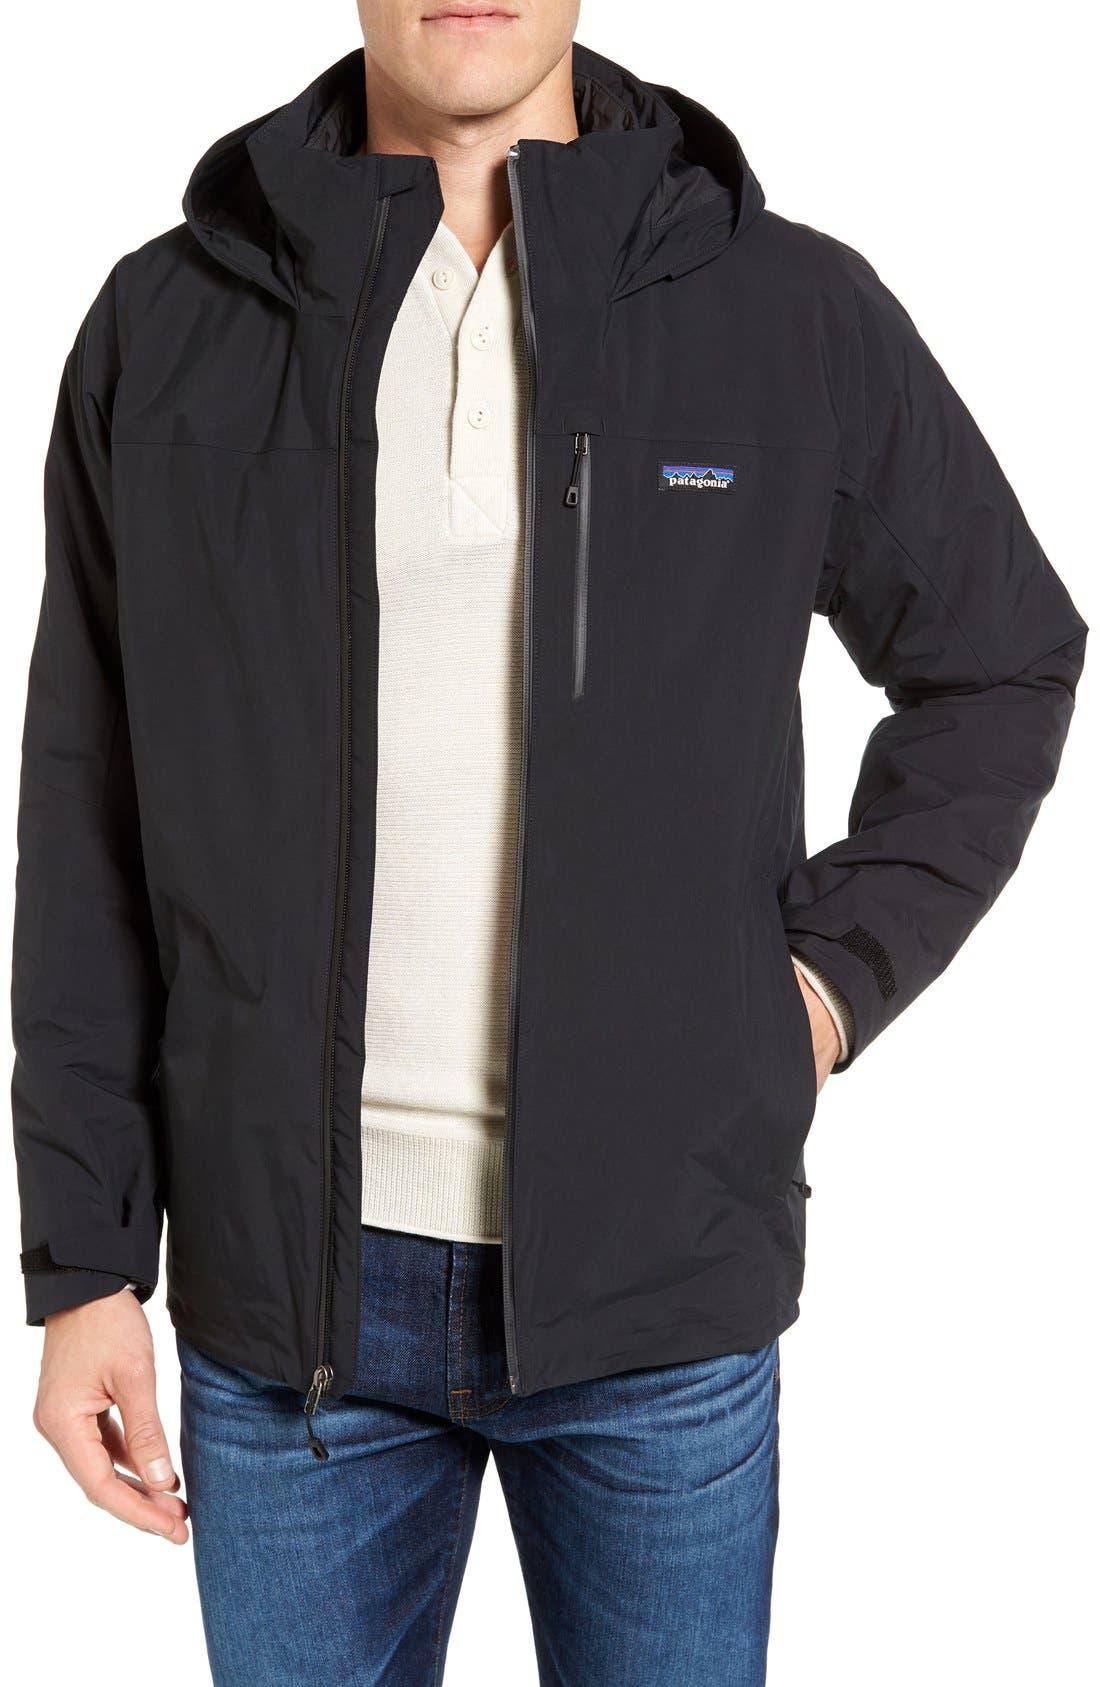 Main Image - Patagonia Windsweep 3-in-1 Jacket